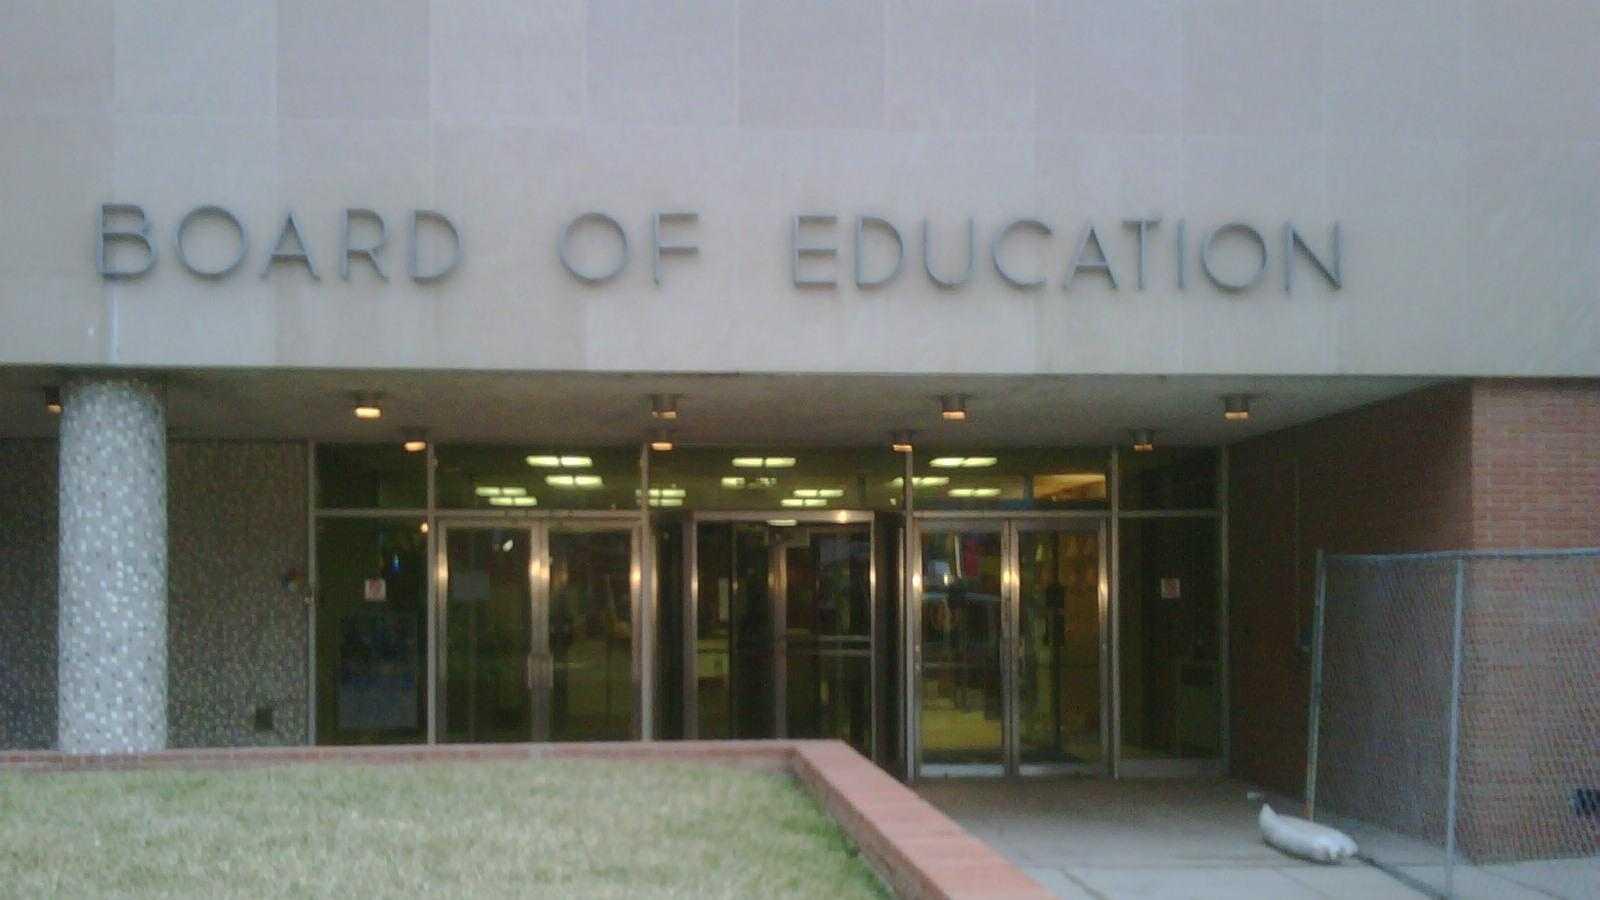 KC Board Of Education, school district headquarters - 22795531